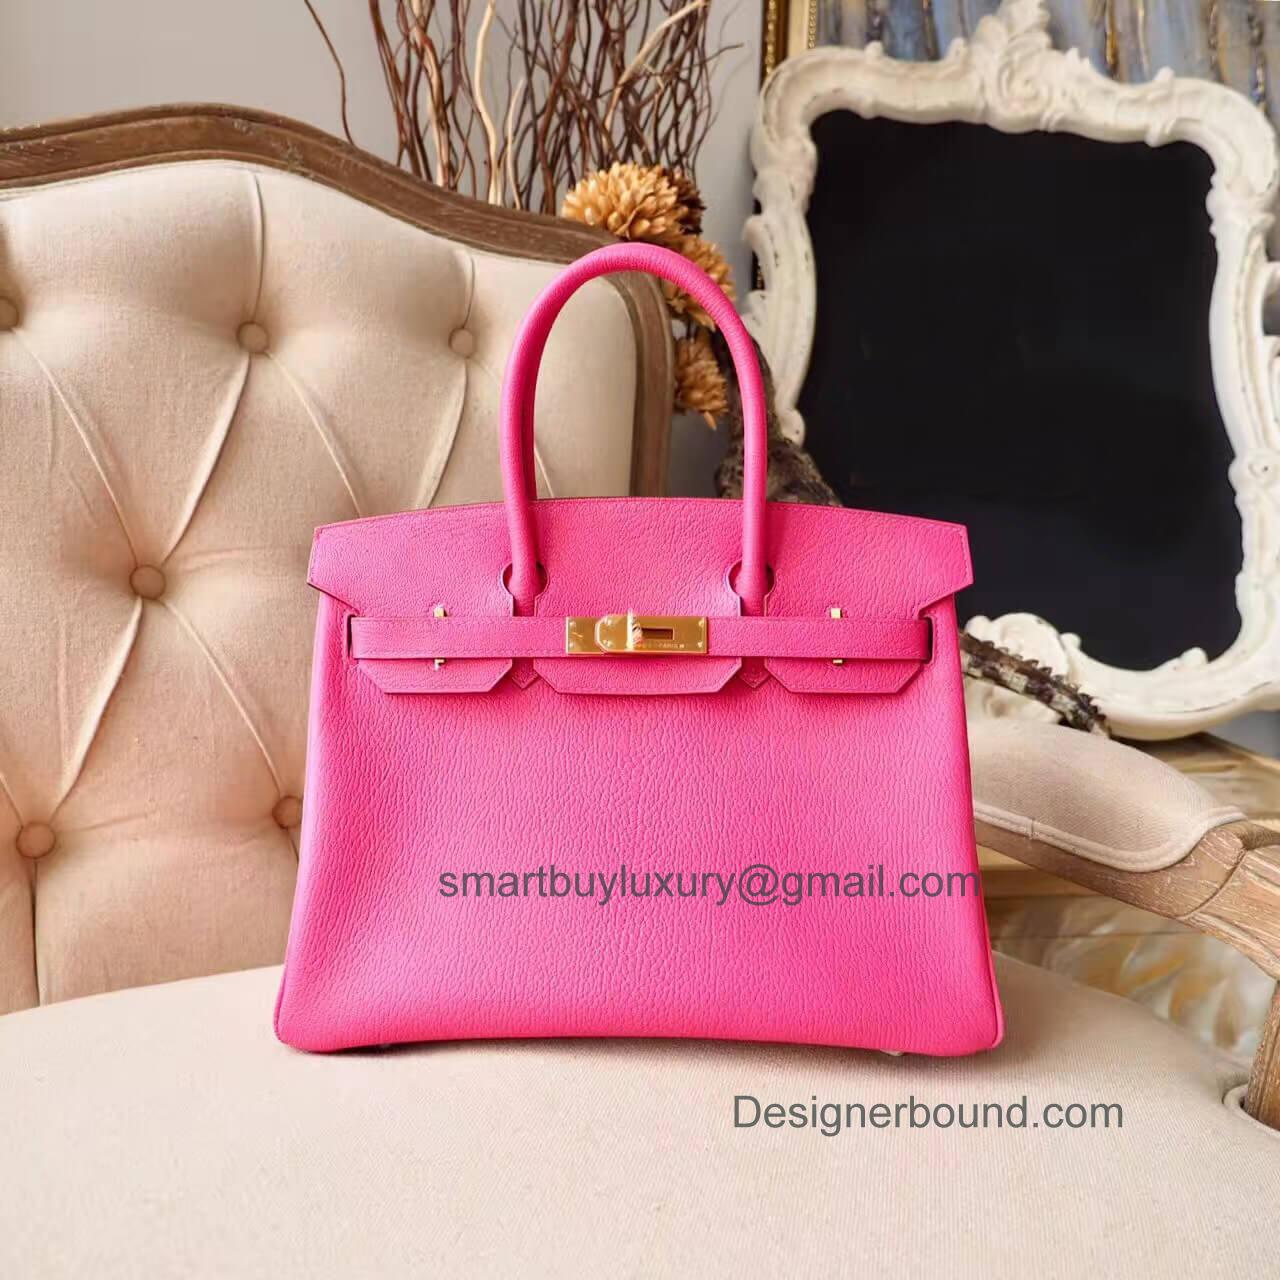 4ea825b5b74c Hermes Birkin 30 Handbag in Bicolored 5r Rose Shocking Chevre Myzore GHW ...